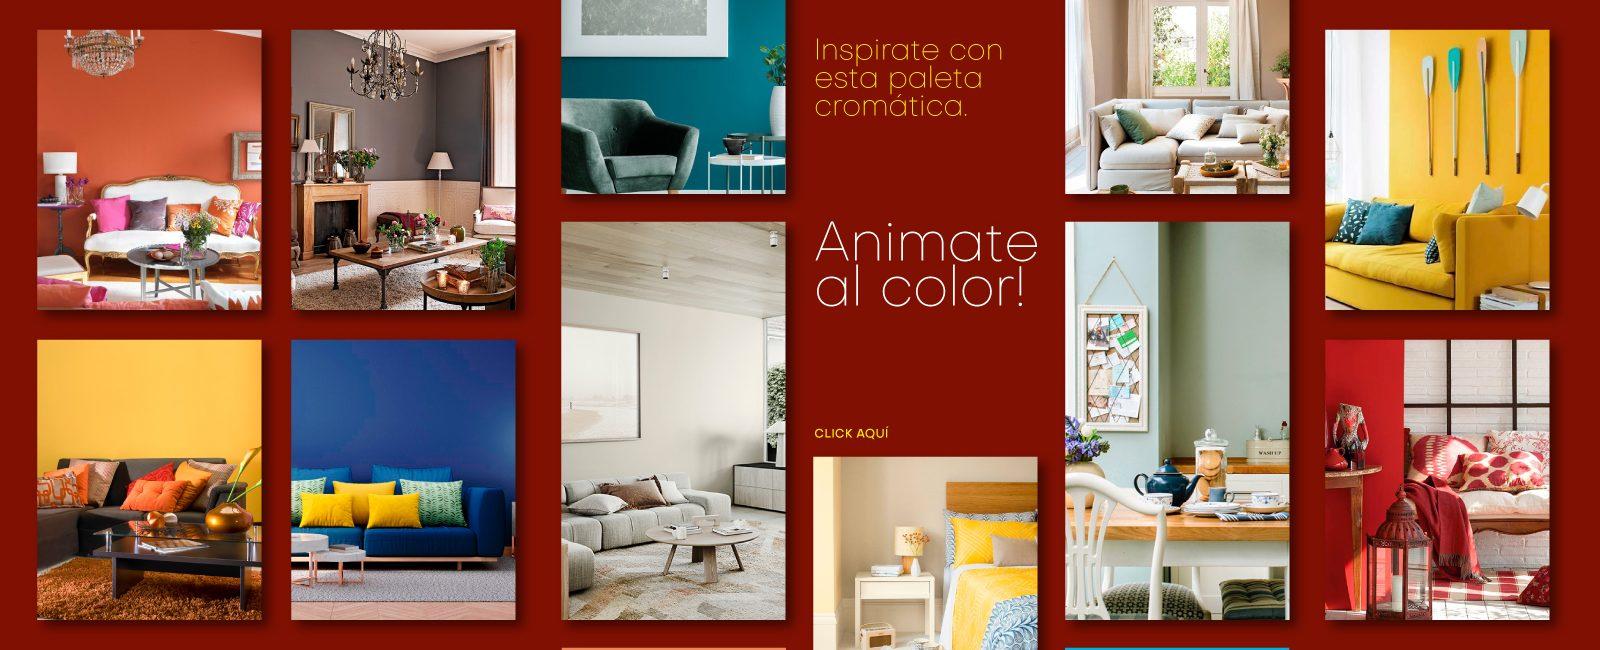 Te presentamos esta atractiva paleta cromática para que te inspires